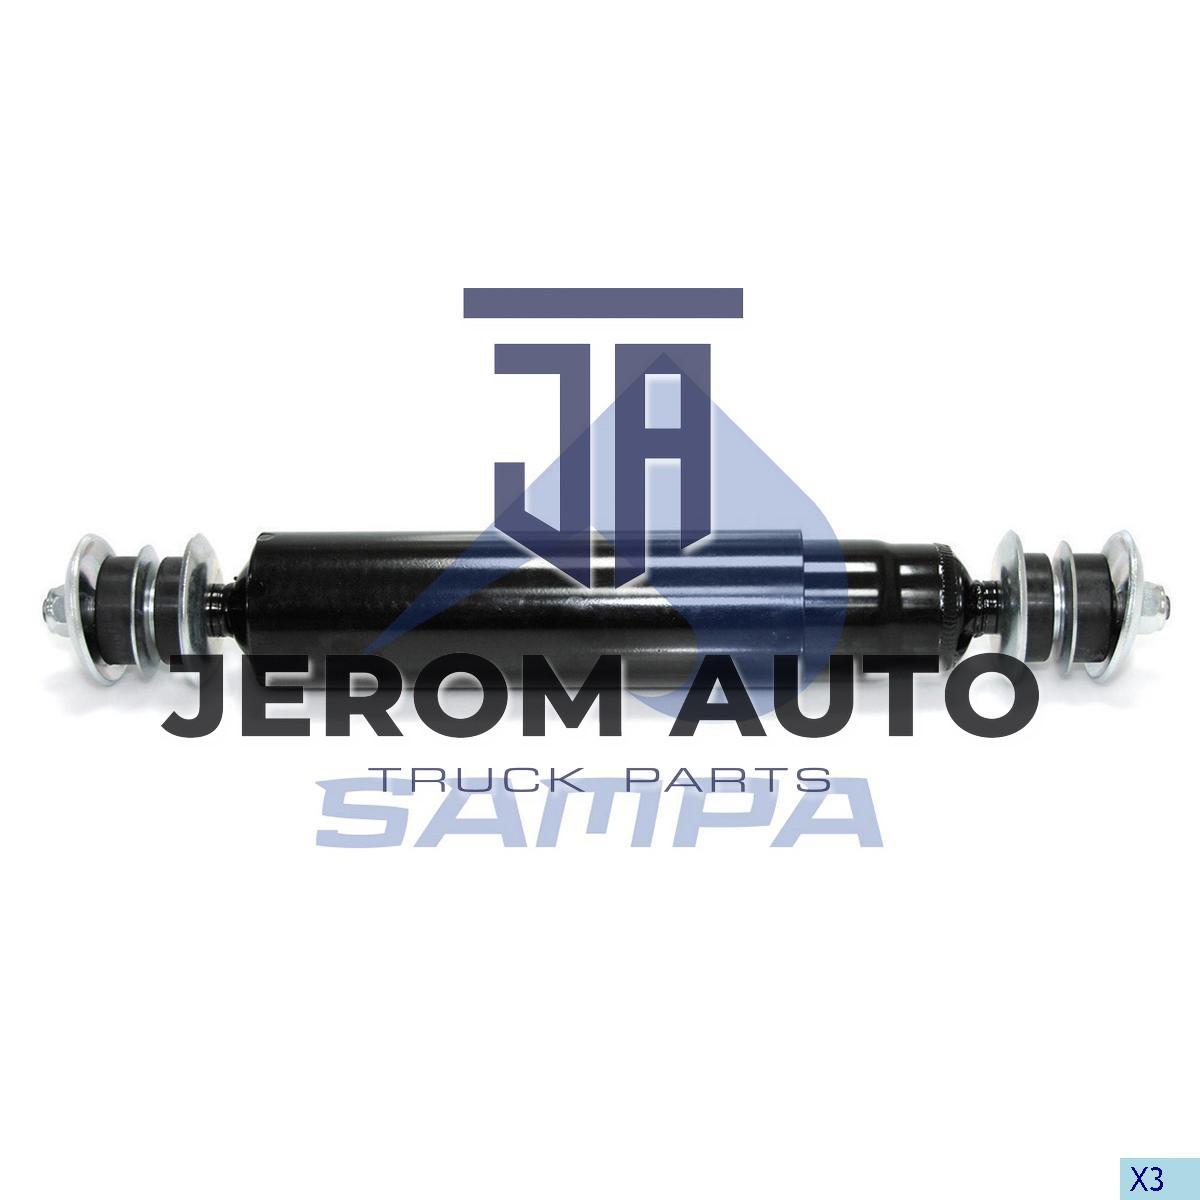 Амортизатор Renault \5010052920 \ 078.218